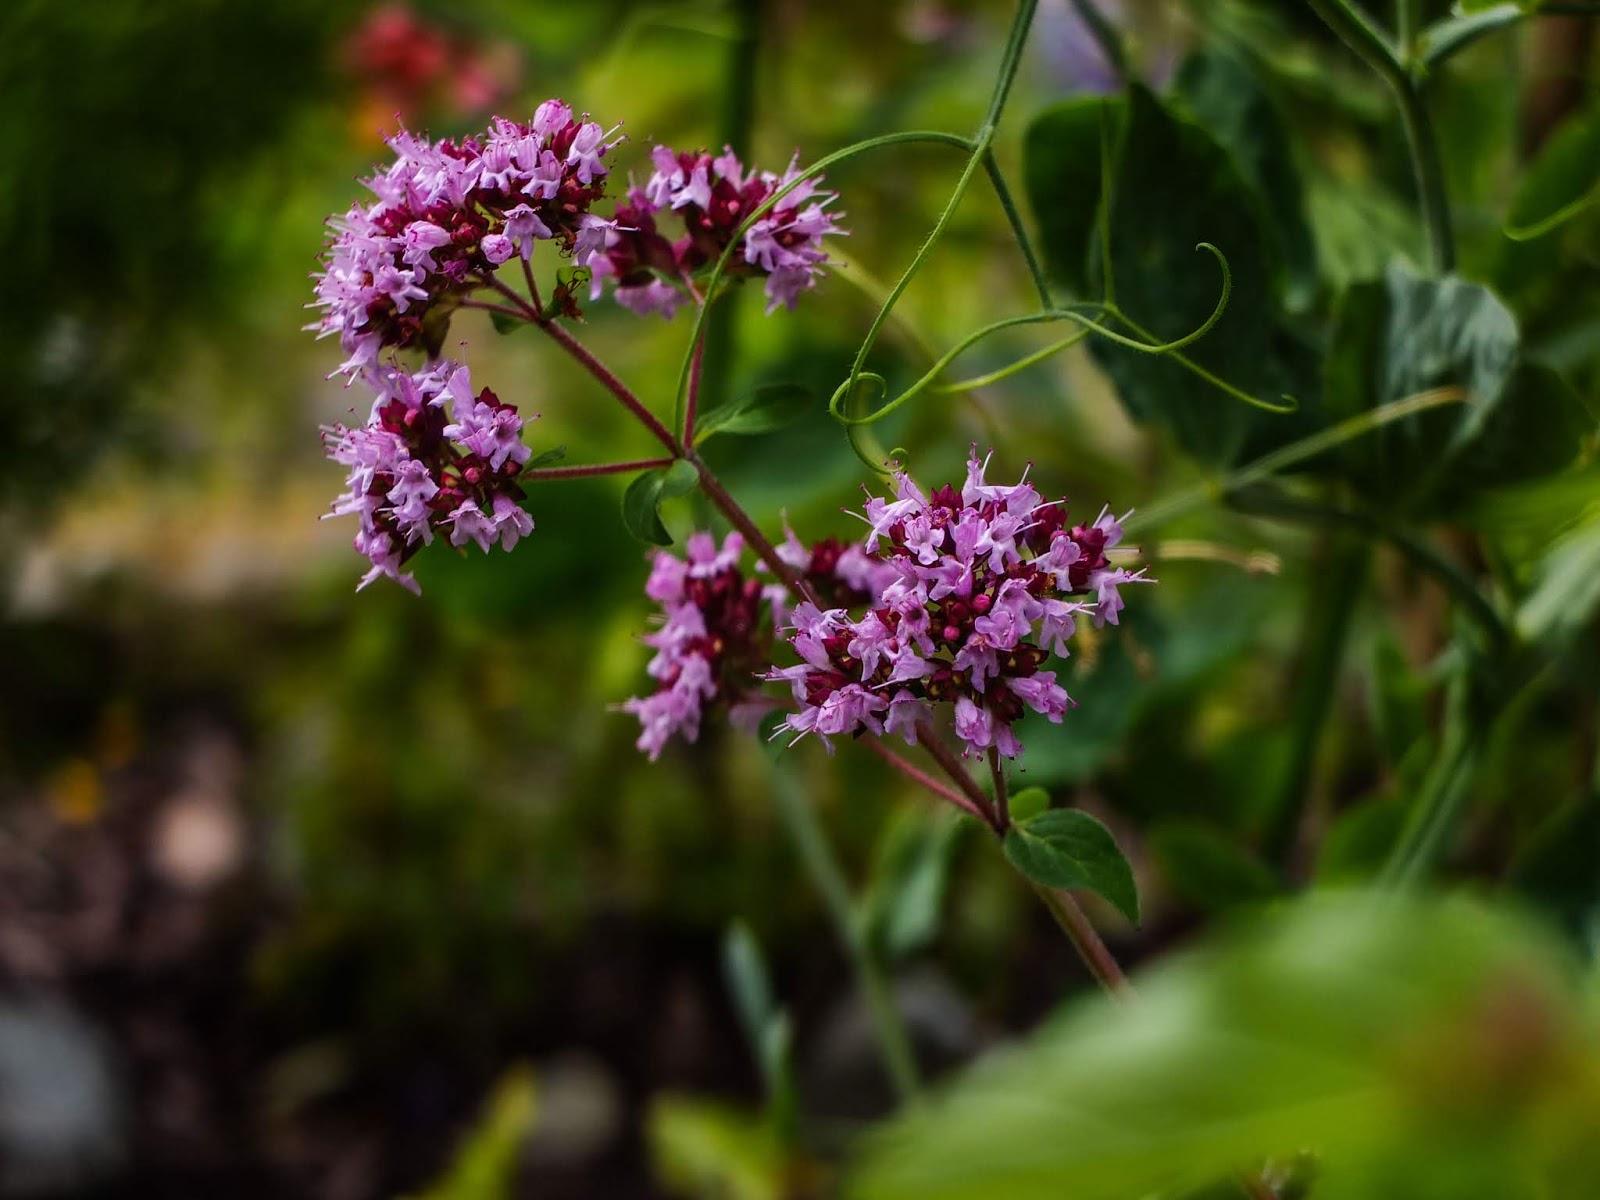 Marjoram flowers and pea tendrils.